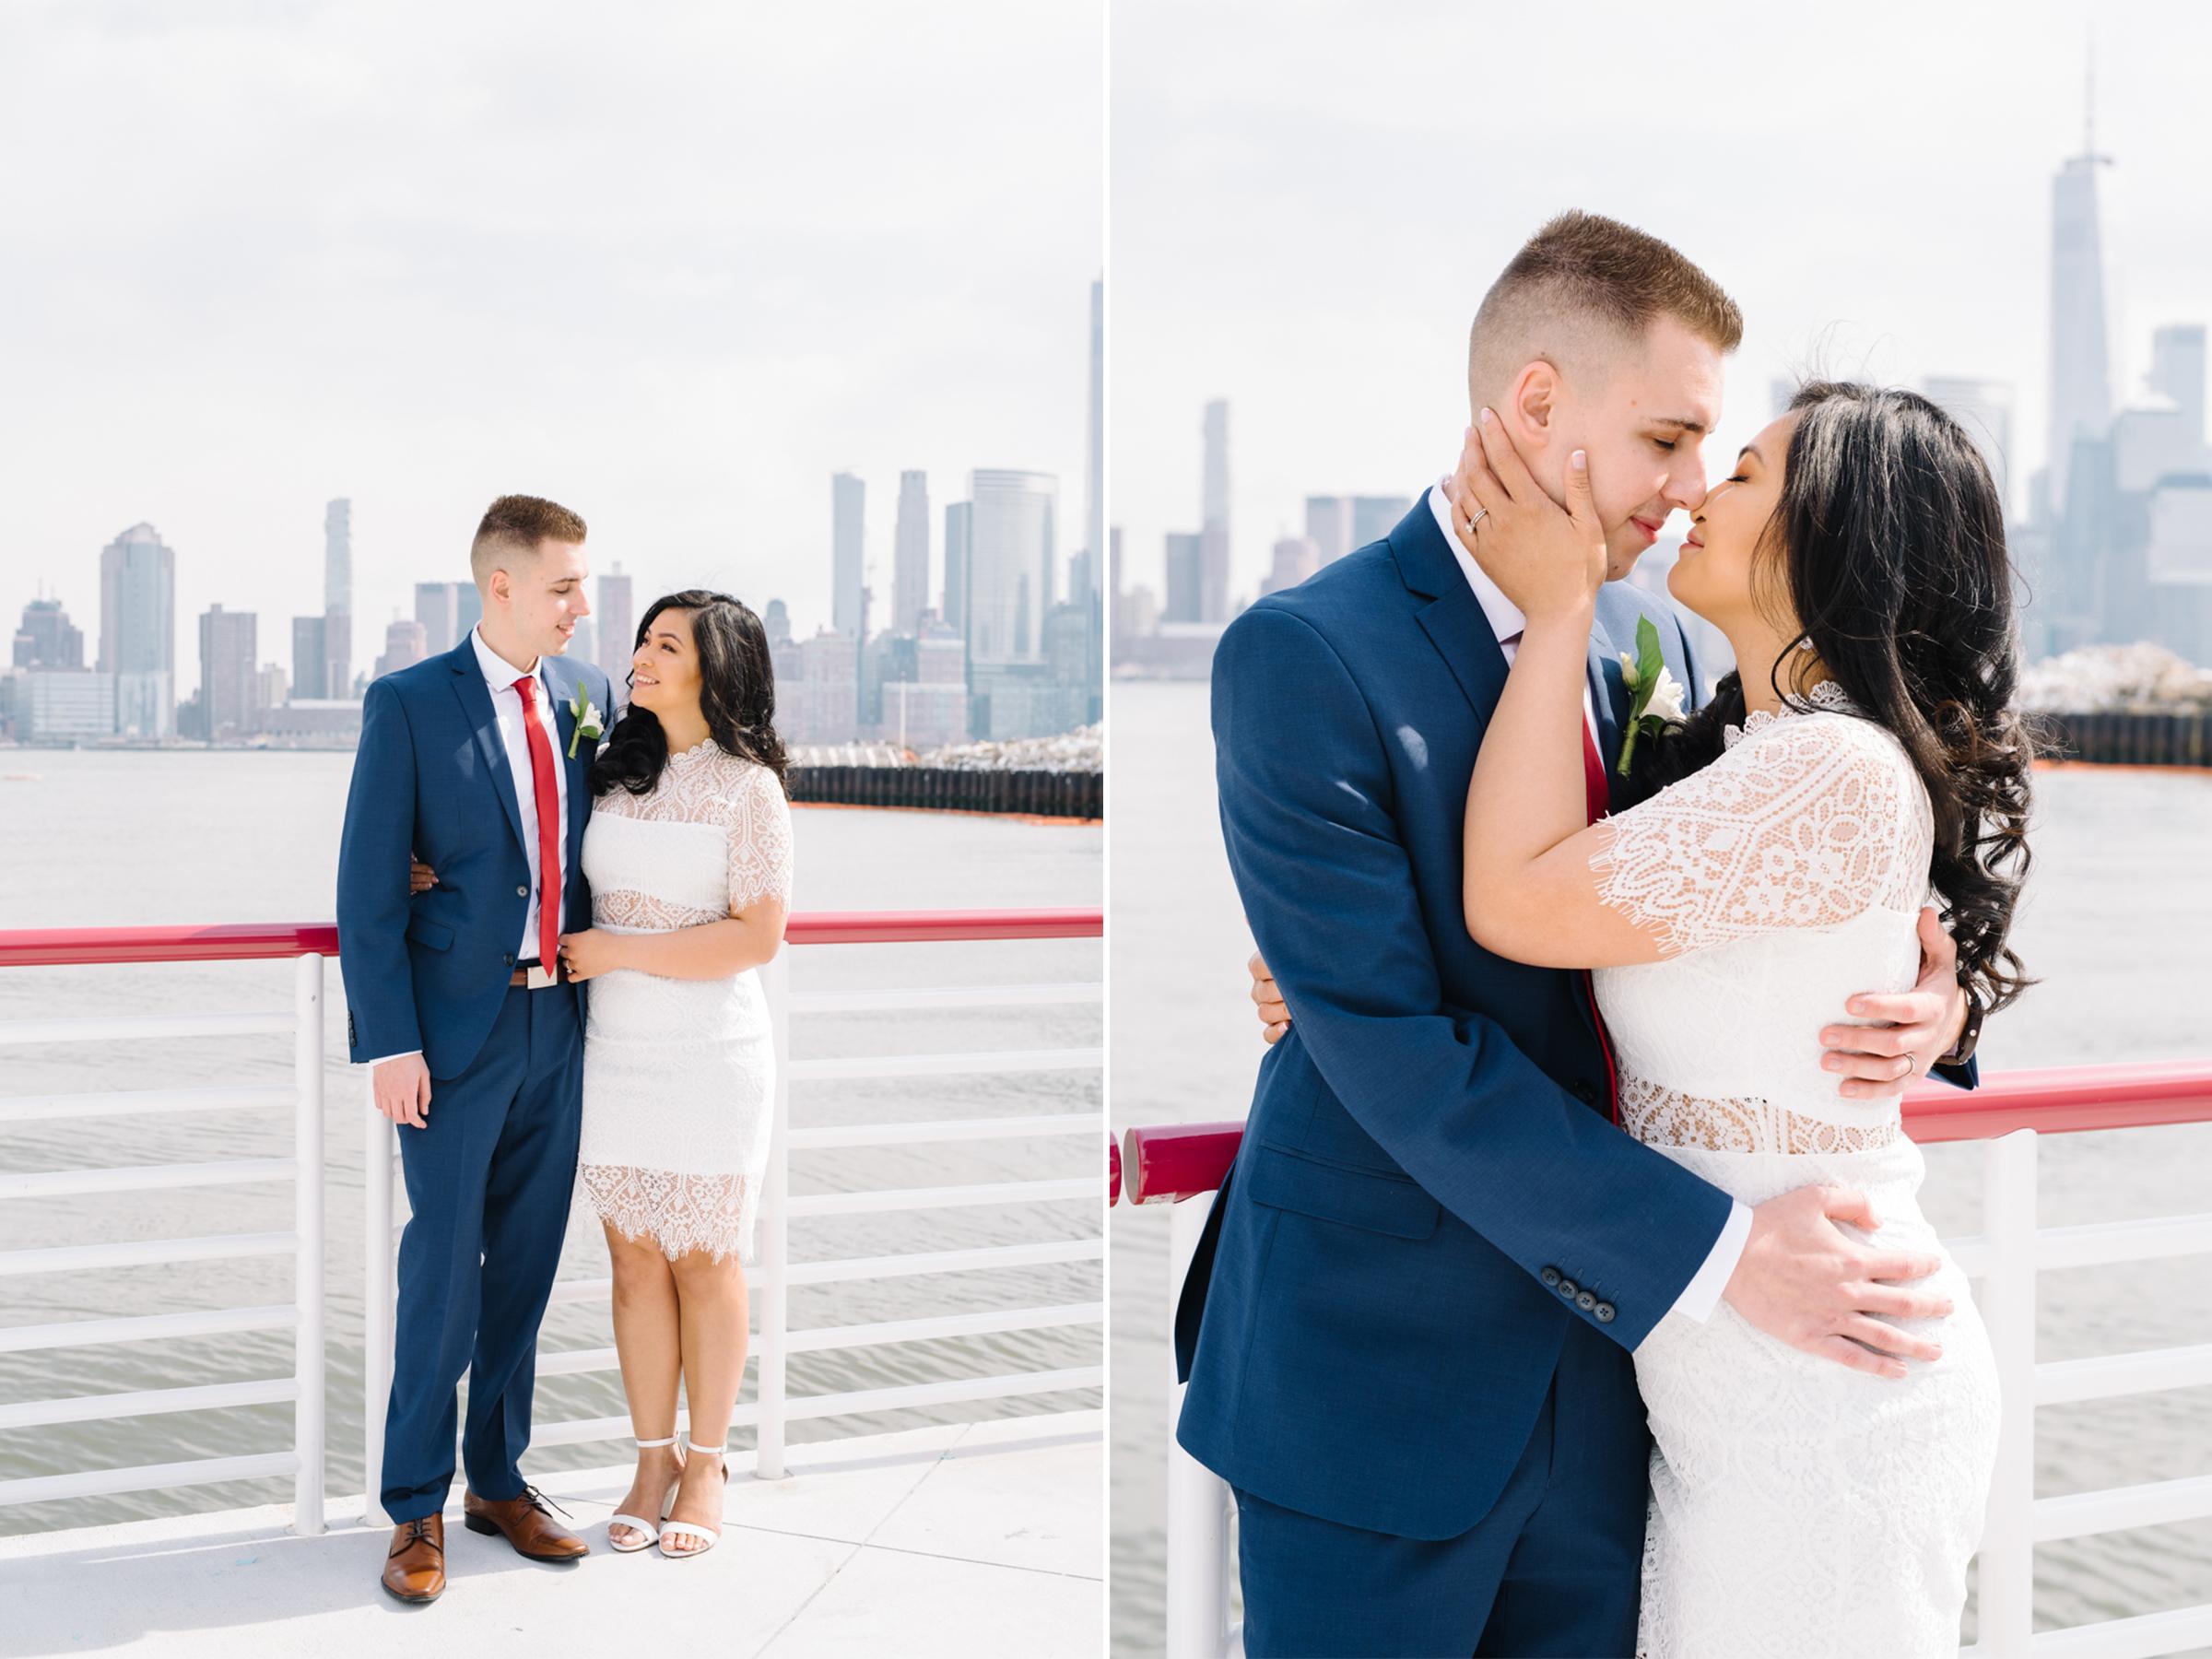 City Hall Wedding- Nichole + Lukasz-Battello NYC Skyline- Jersey City New Jersey- Olivia Christina Photo.jpg